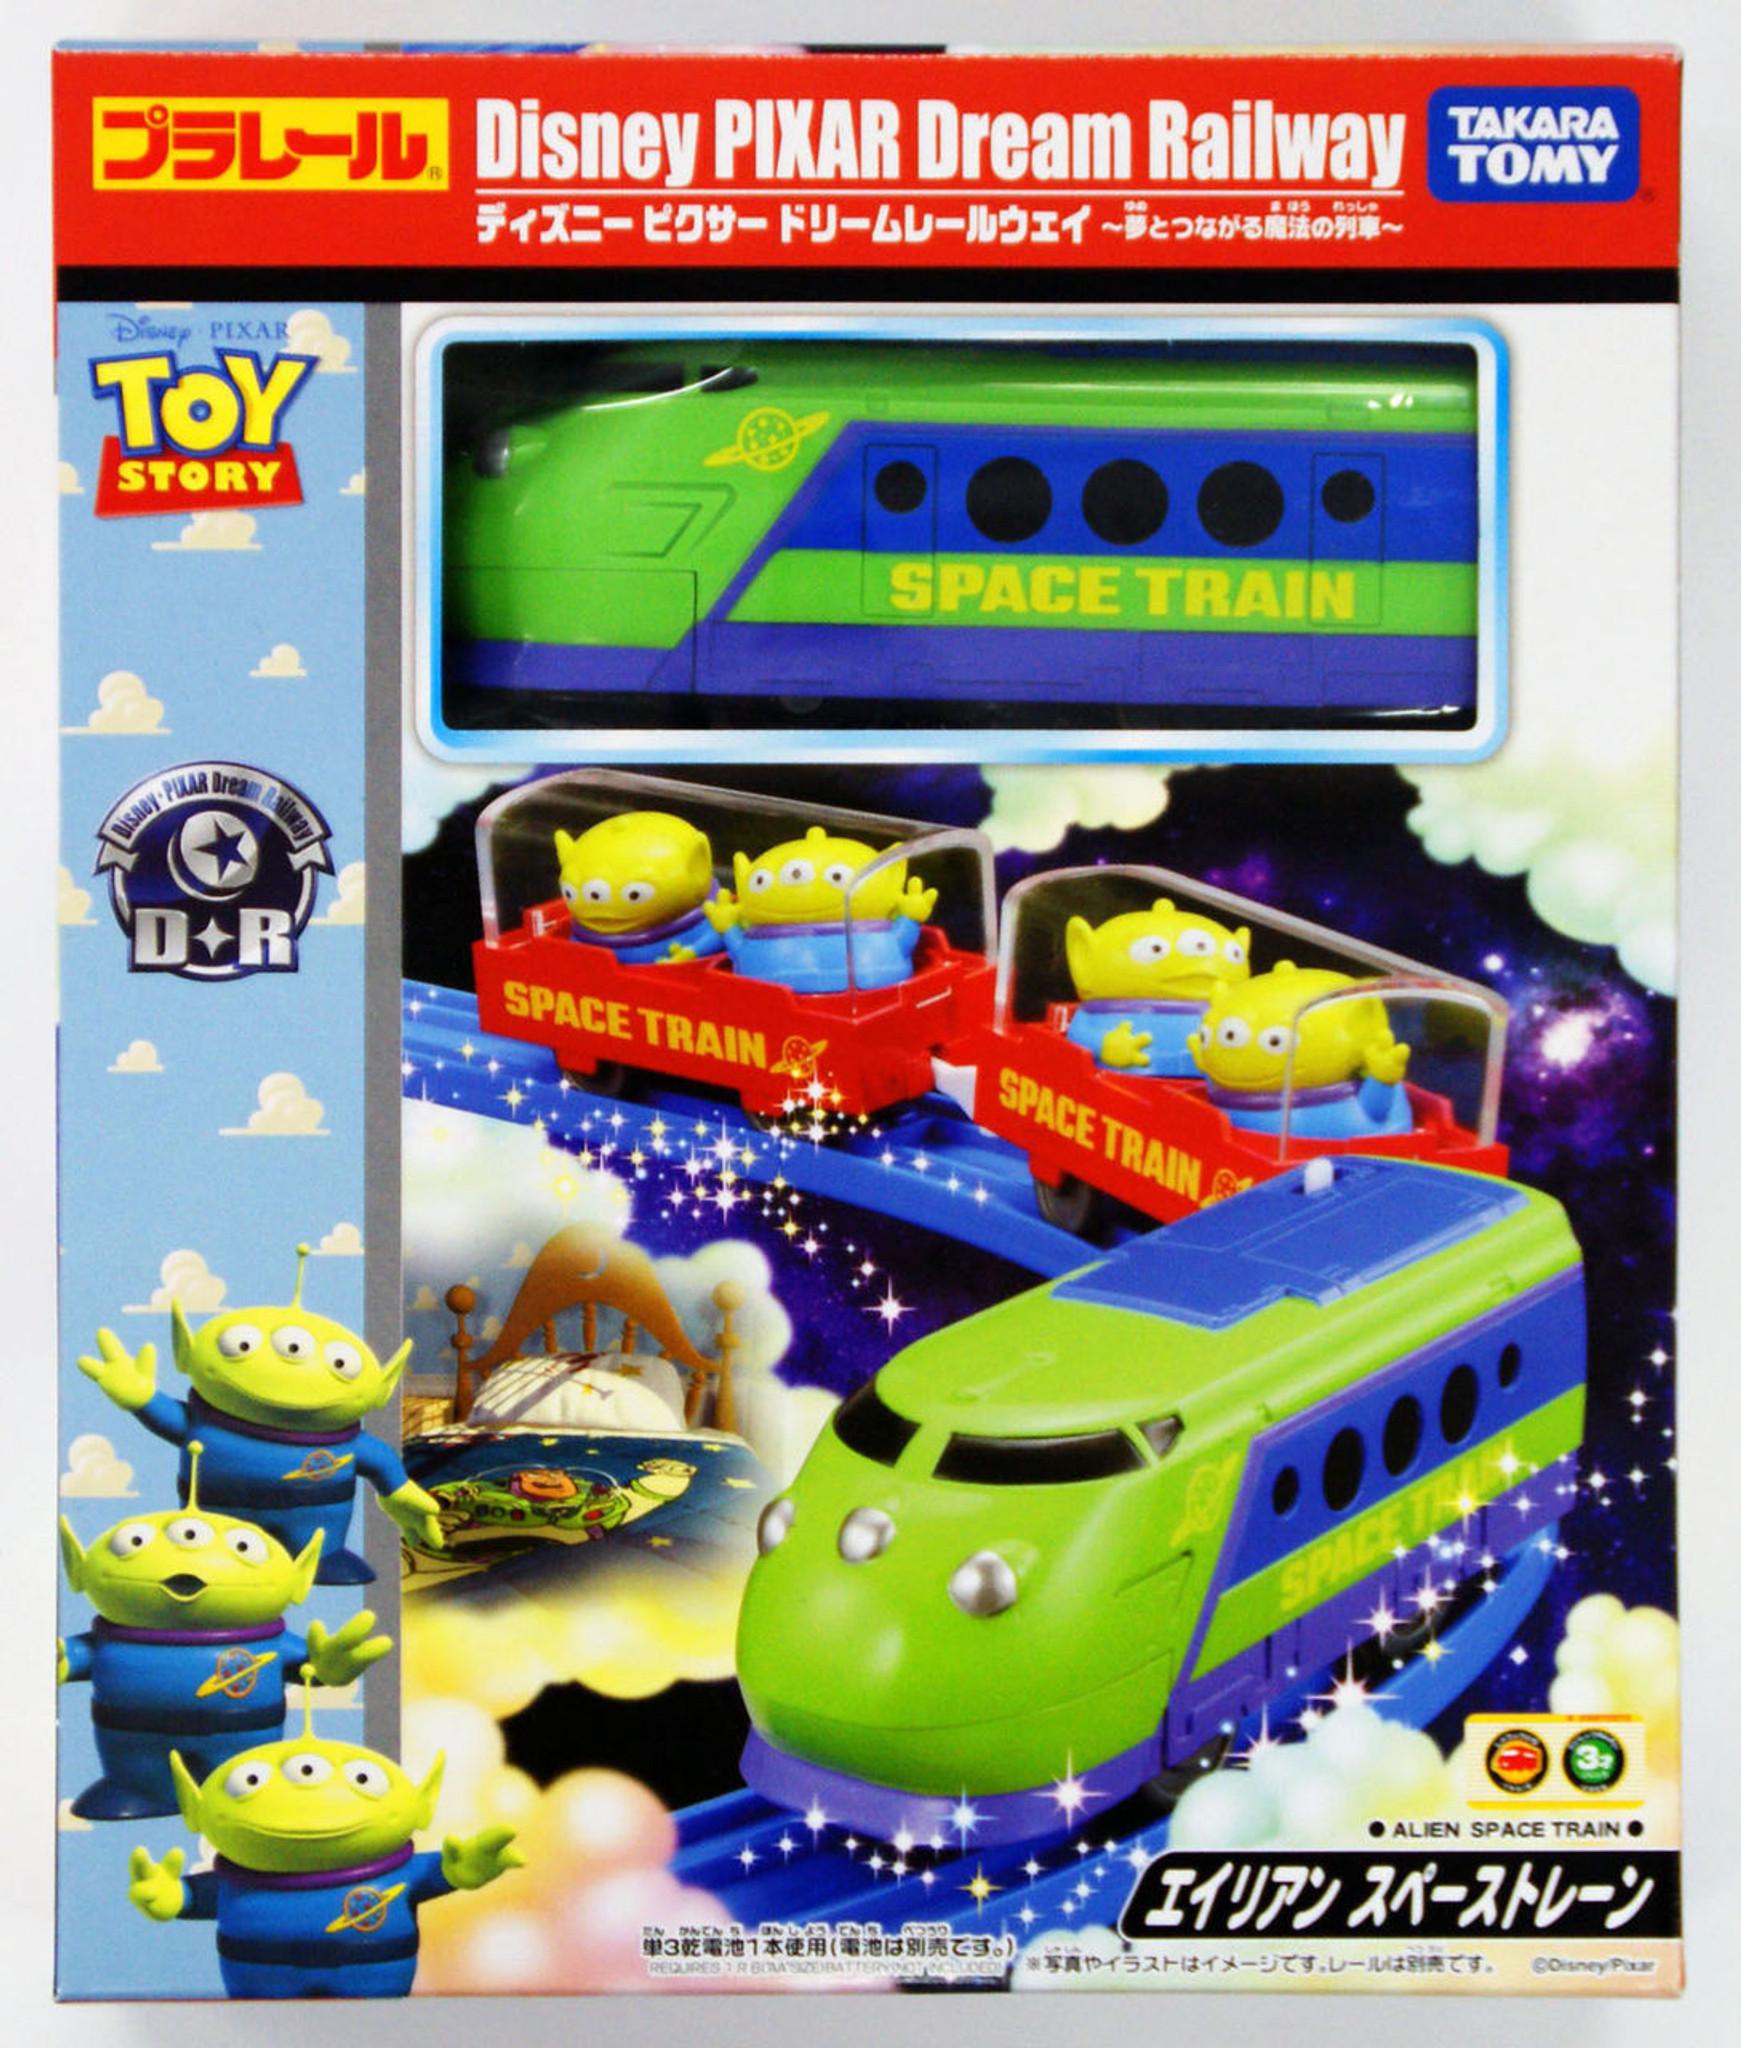 What dream railway 40